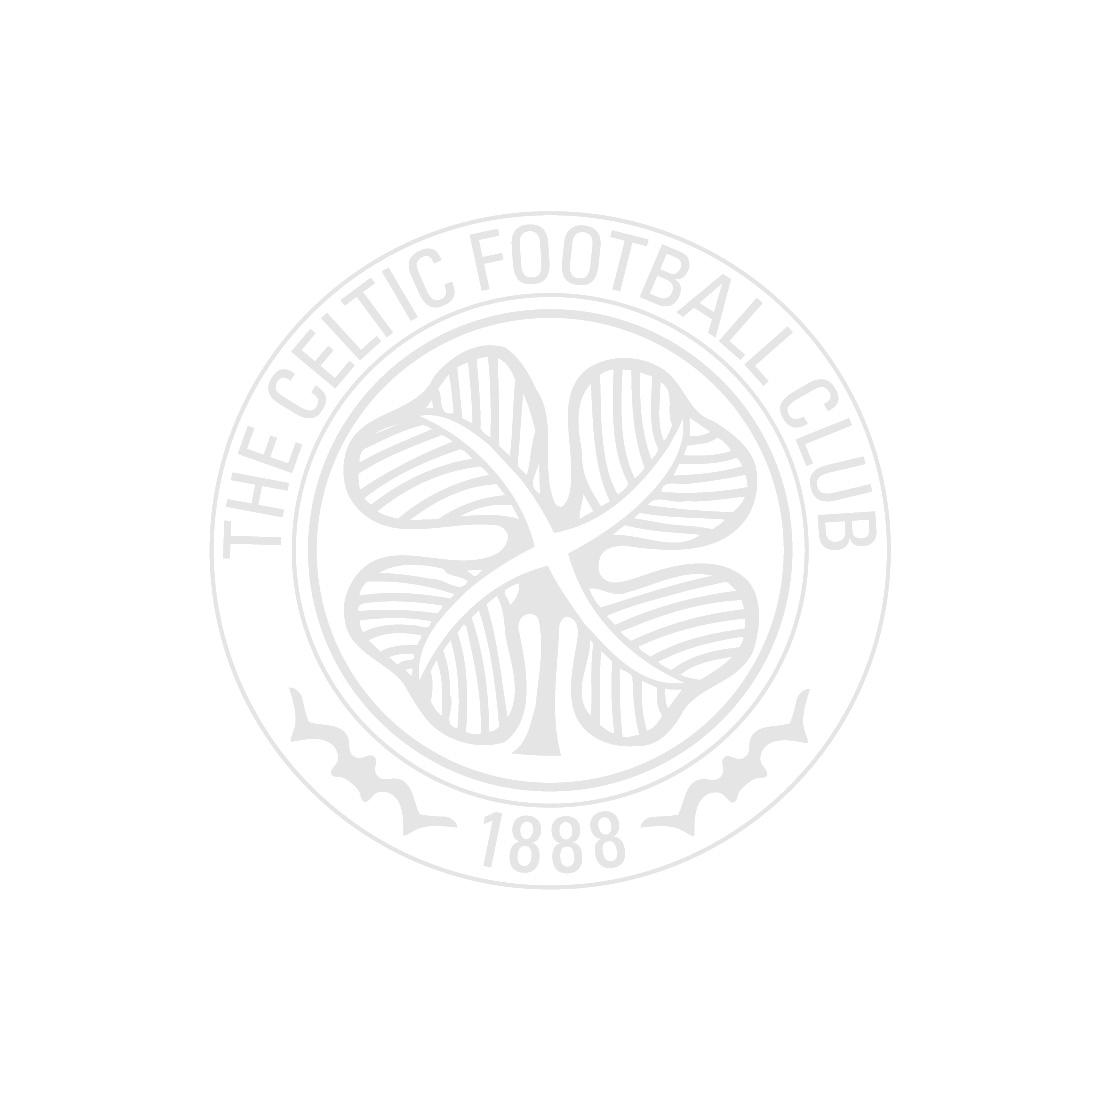 Celtic 1988 Double Winners Print